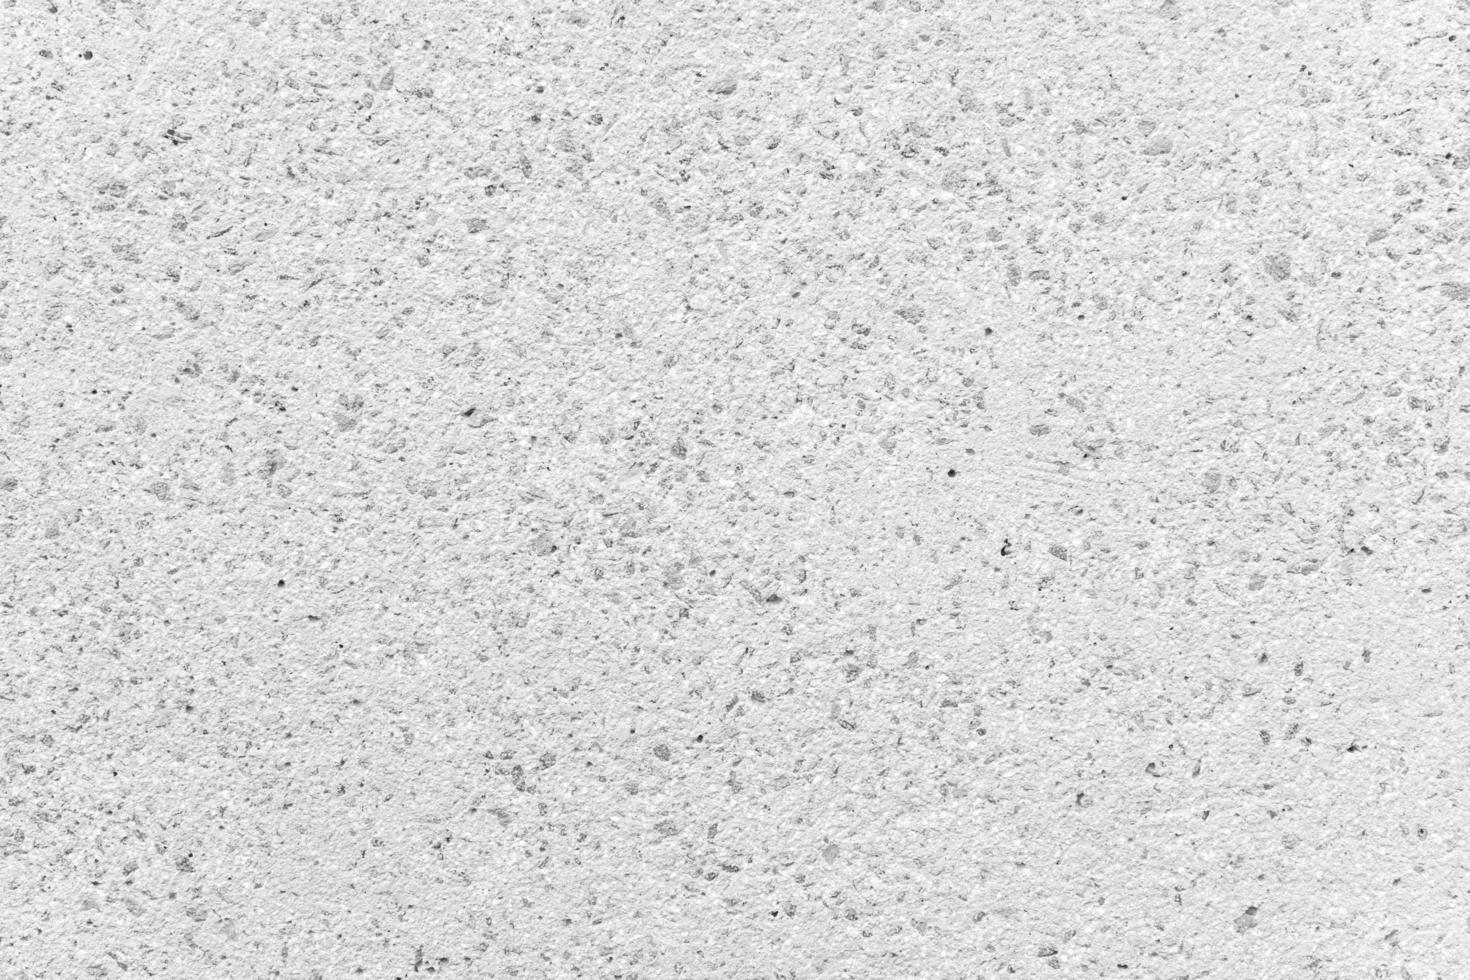 Light gray concrete surface photo